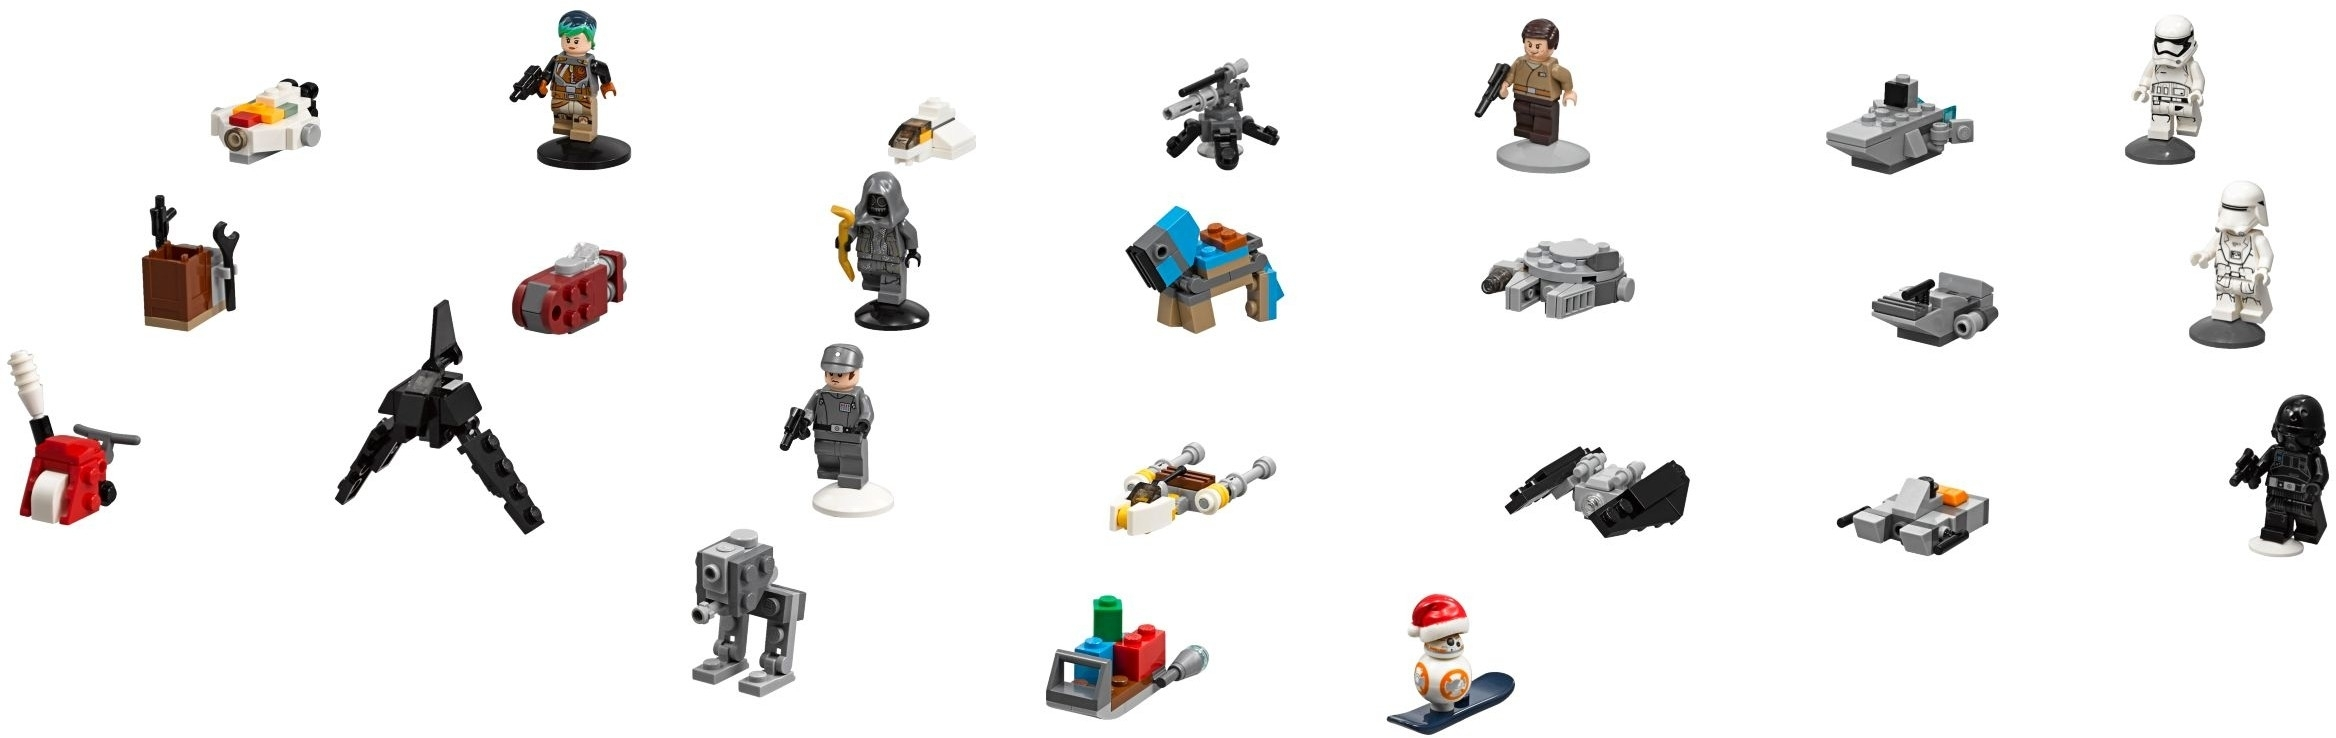 Lego 75184 Star Wars Advent Calendar Instructions, Star Wars